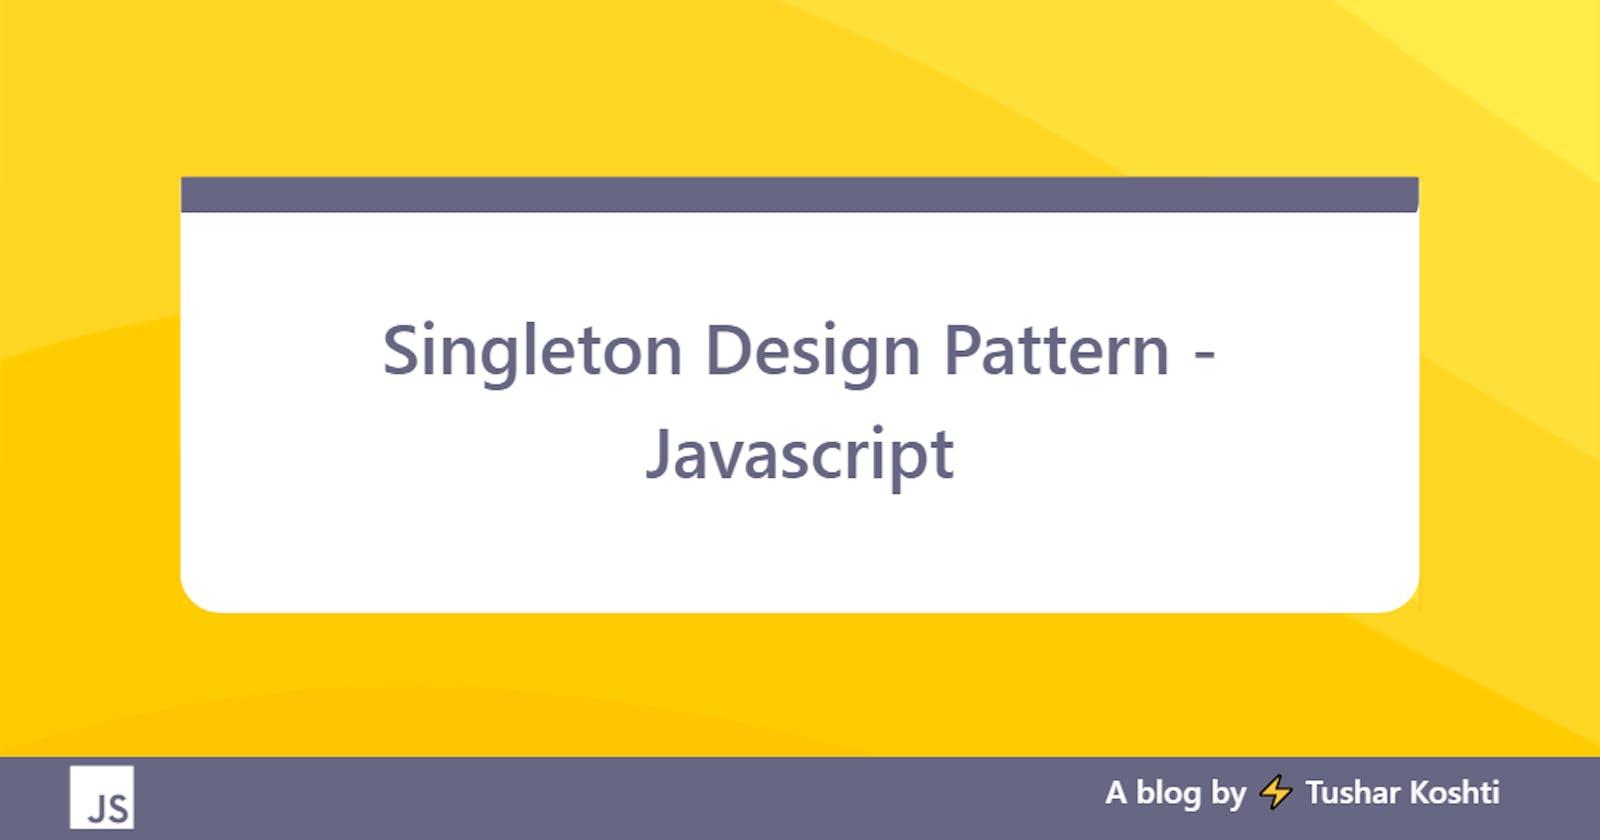 Singleton Design Pattern - Javascript